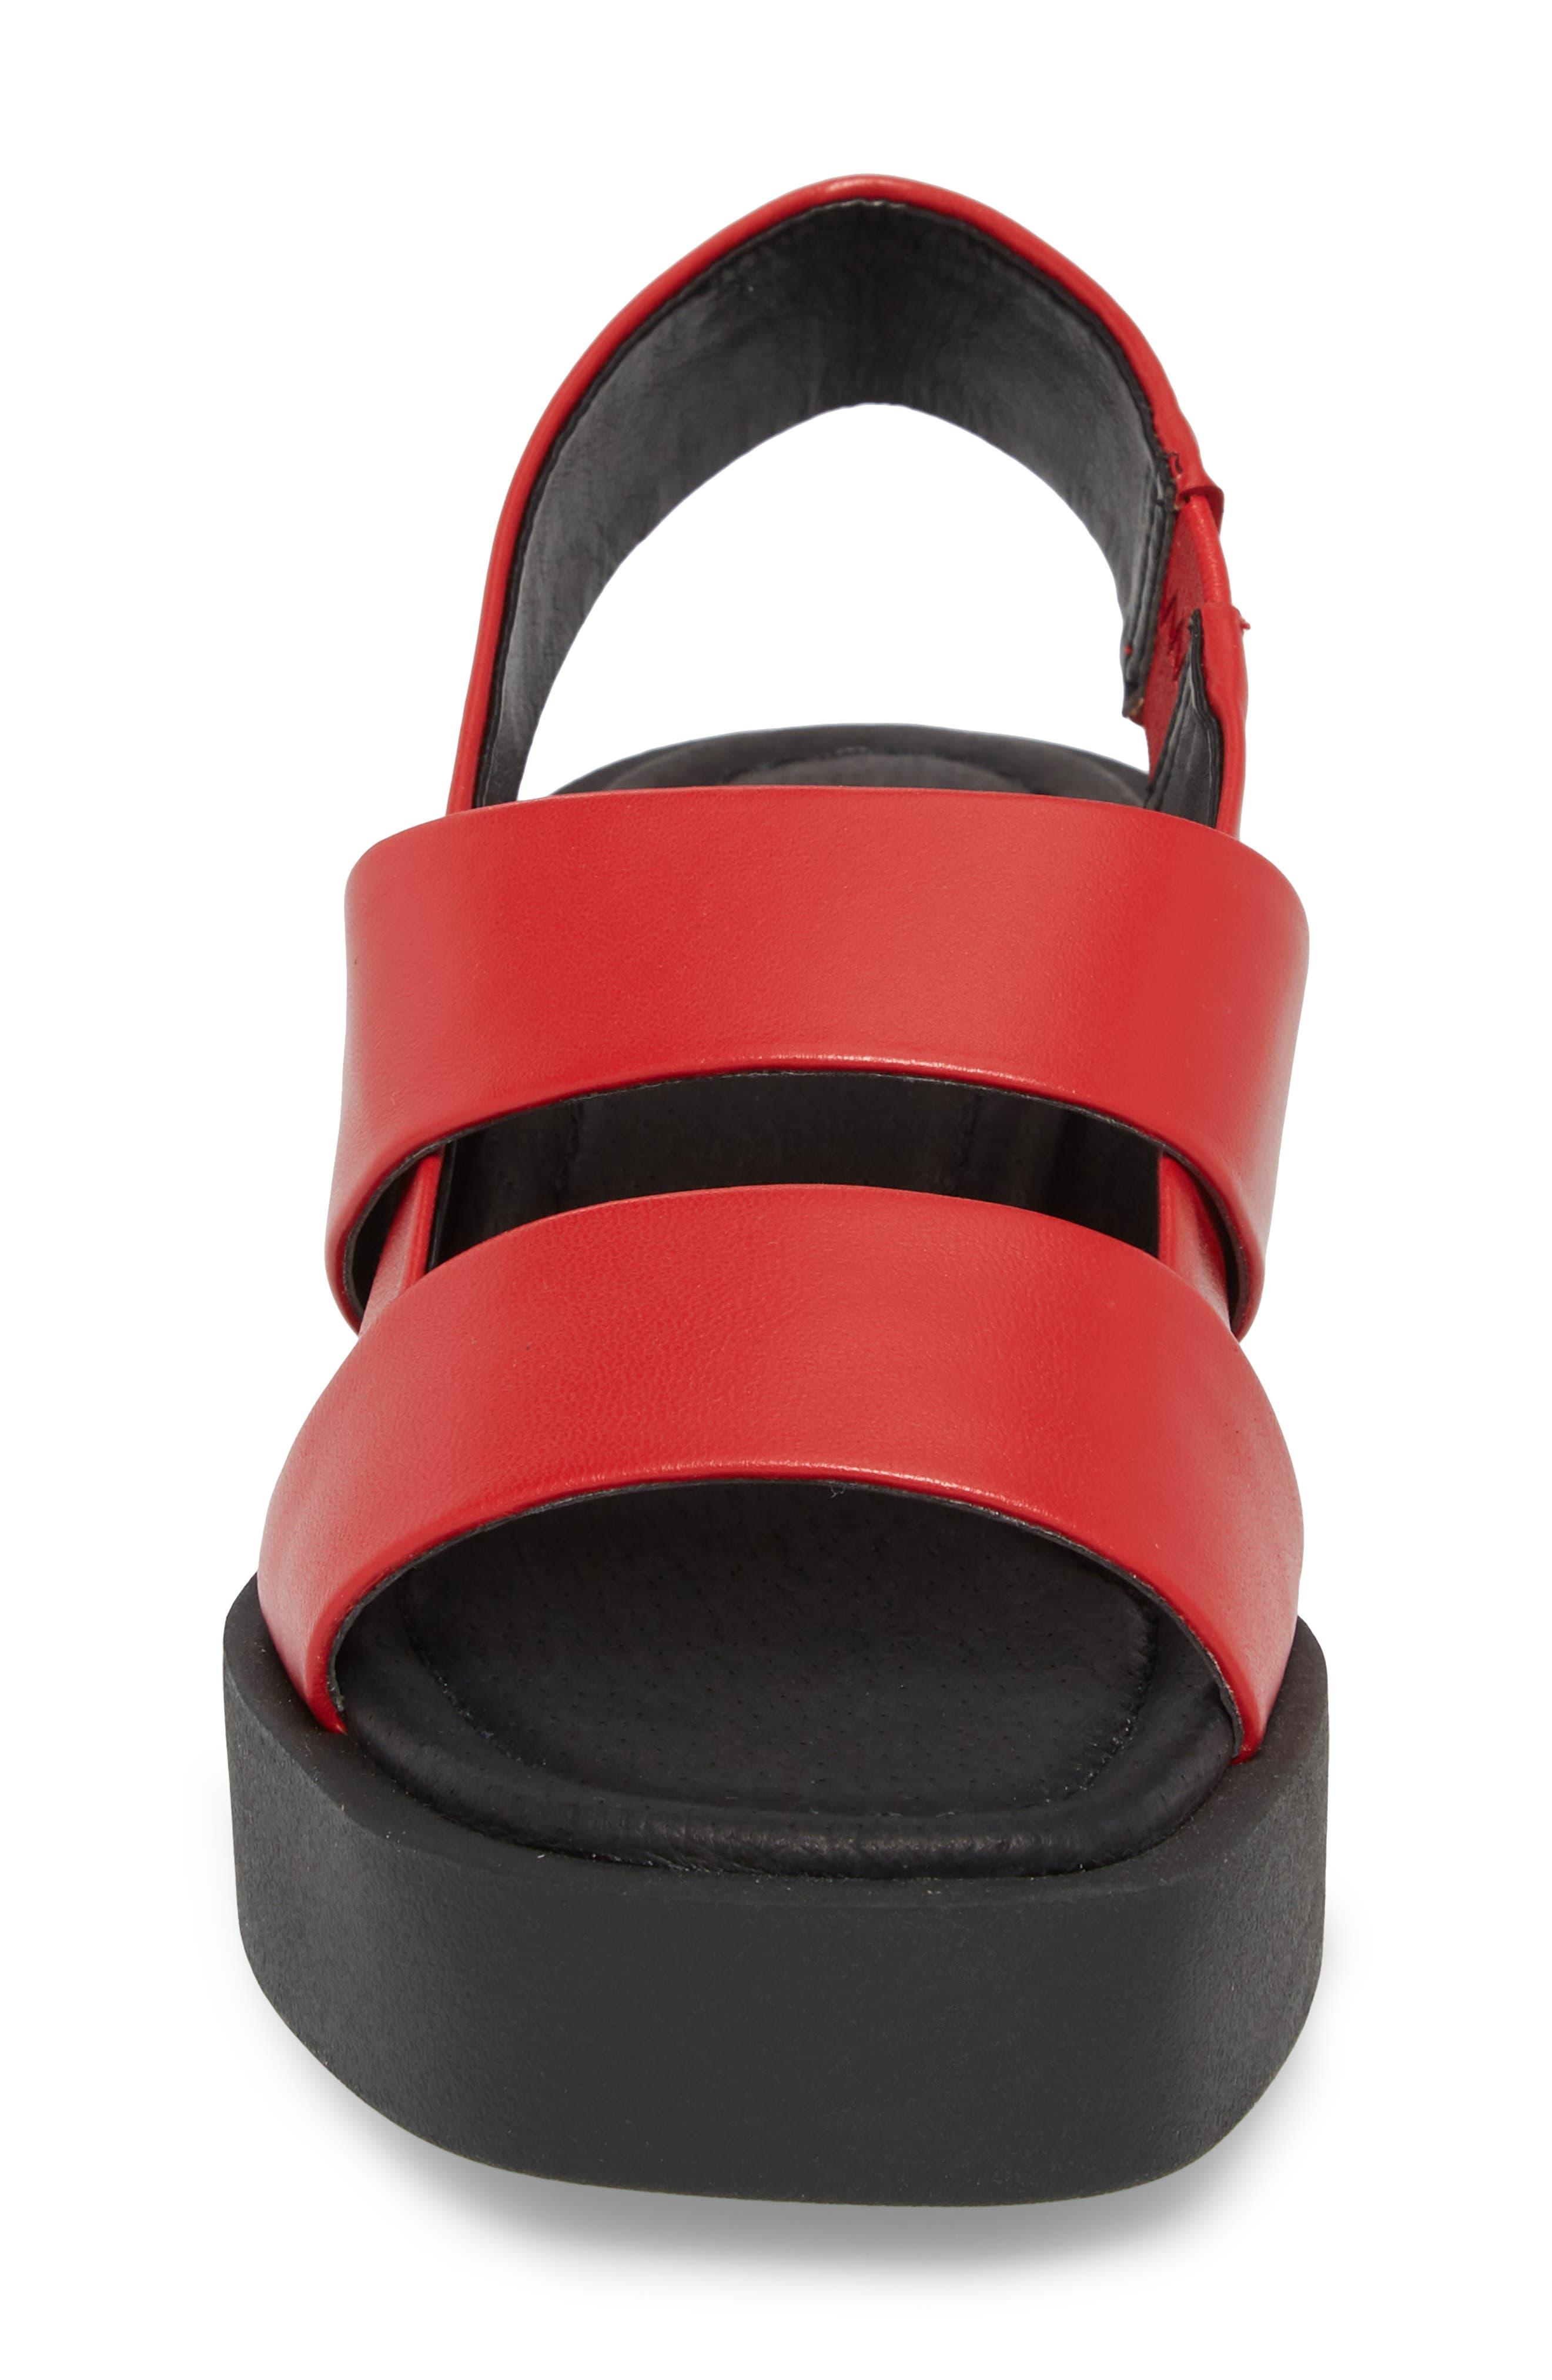 Hazel Slingback Sandal,                             Alternate thumbnail 4, color,                             Red Leather